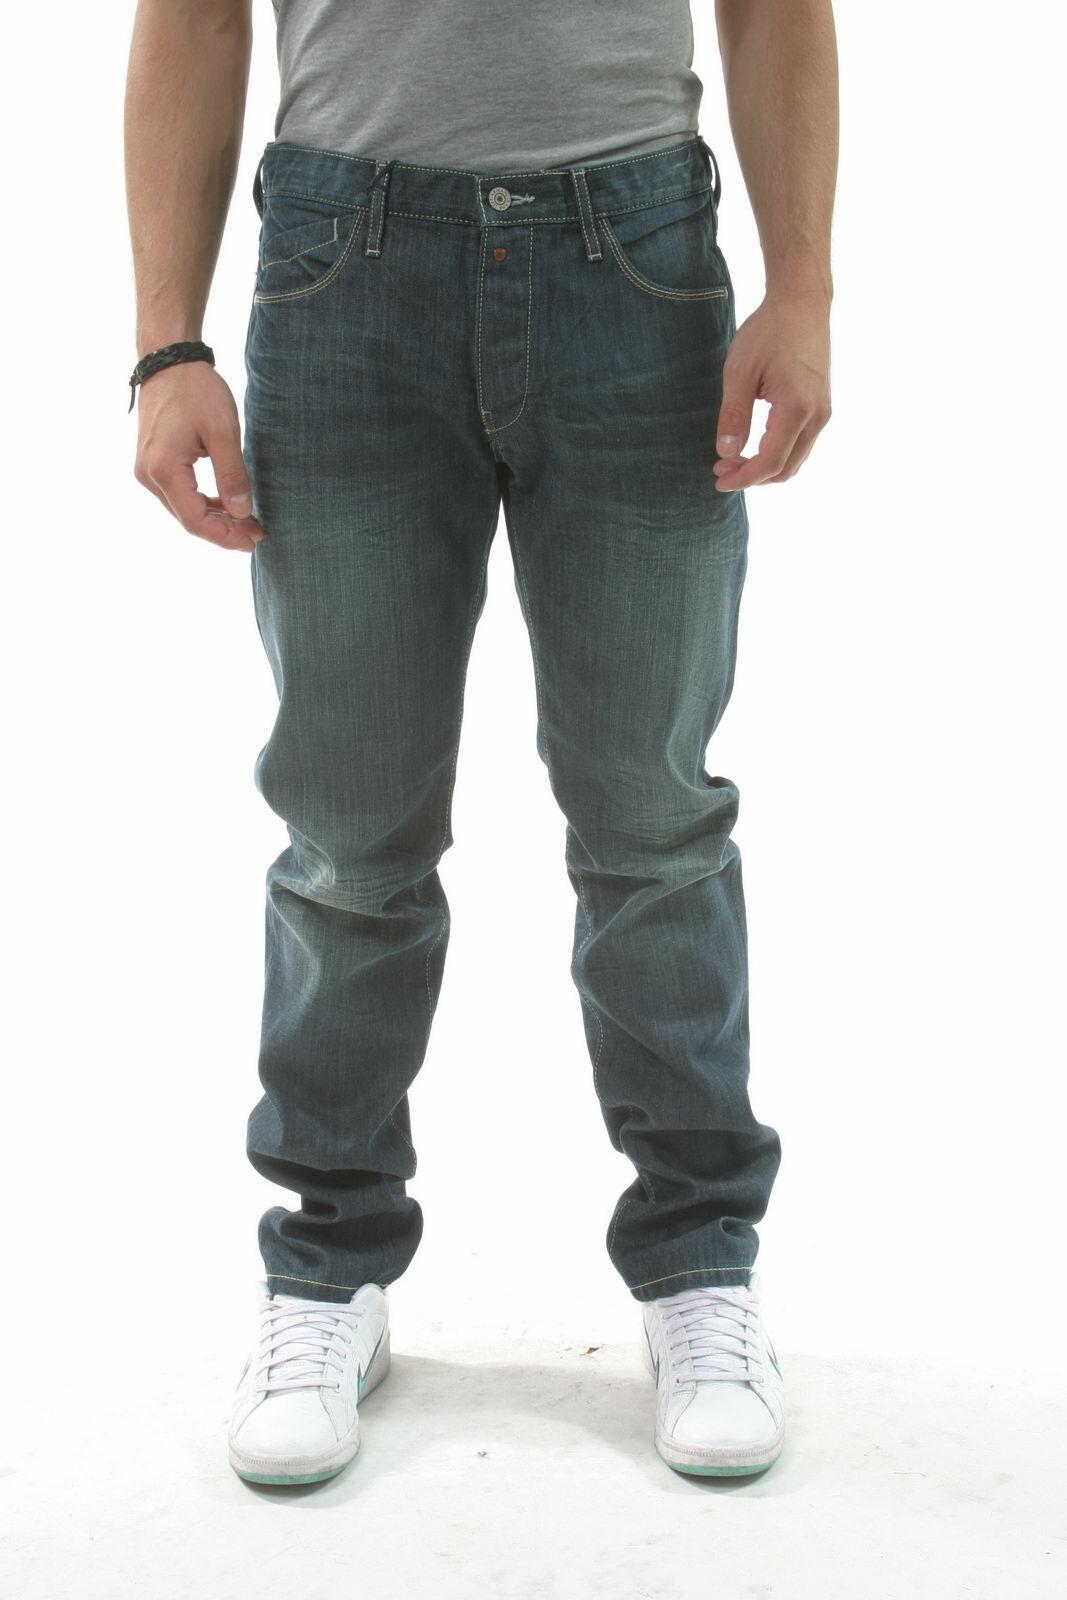 Armani Jeans AJ Jeans SLIM FIT Cotton Man Denim V6J037J 15 Sz.34 MAKE OFFER